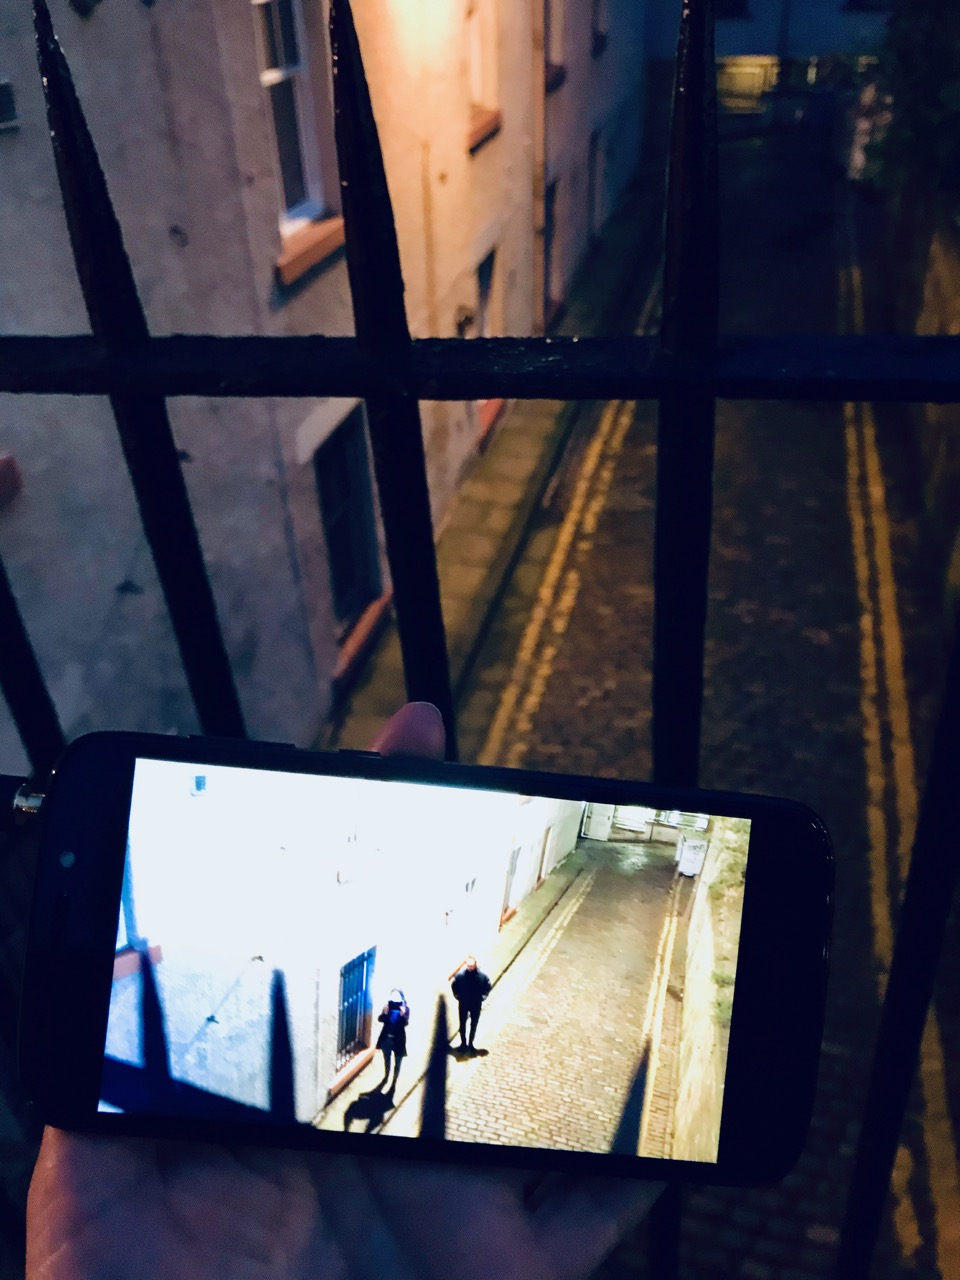 ExcerptCardiff and Miller, Night Walk for Edinburgh video walk